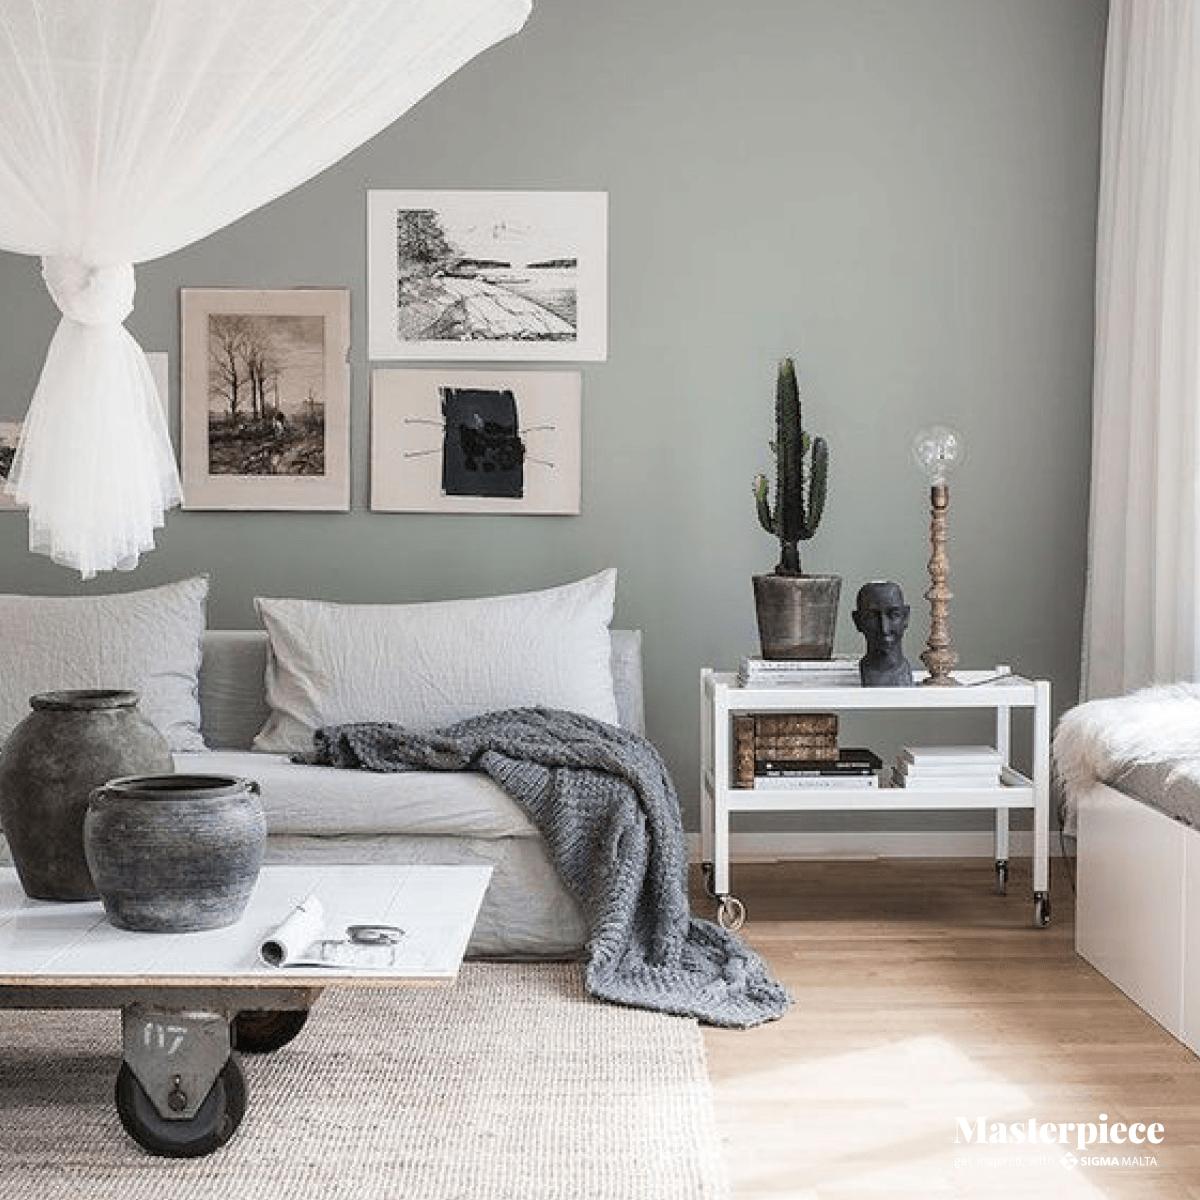 An artistic </br><span> living room </span>